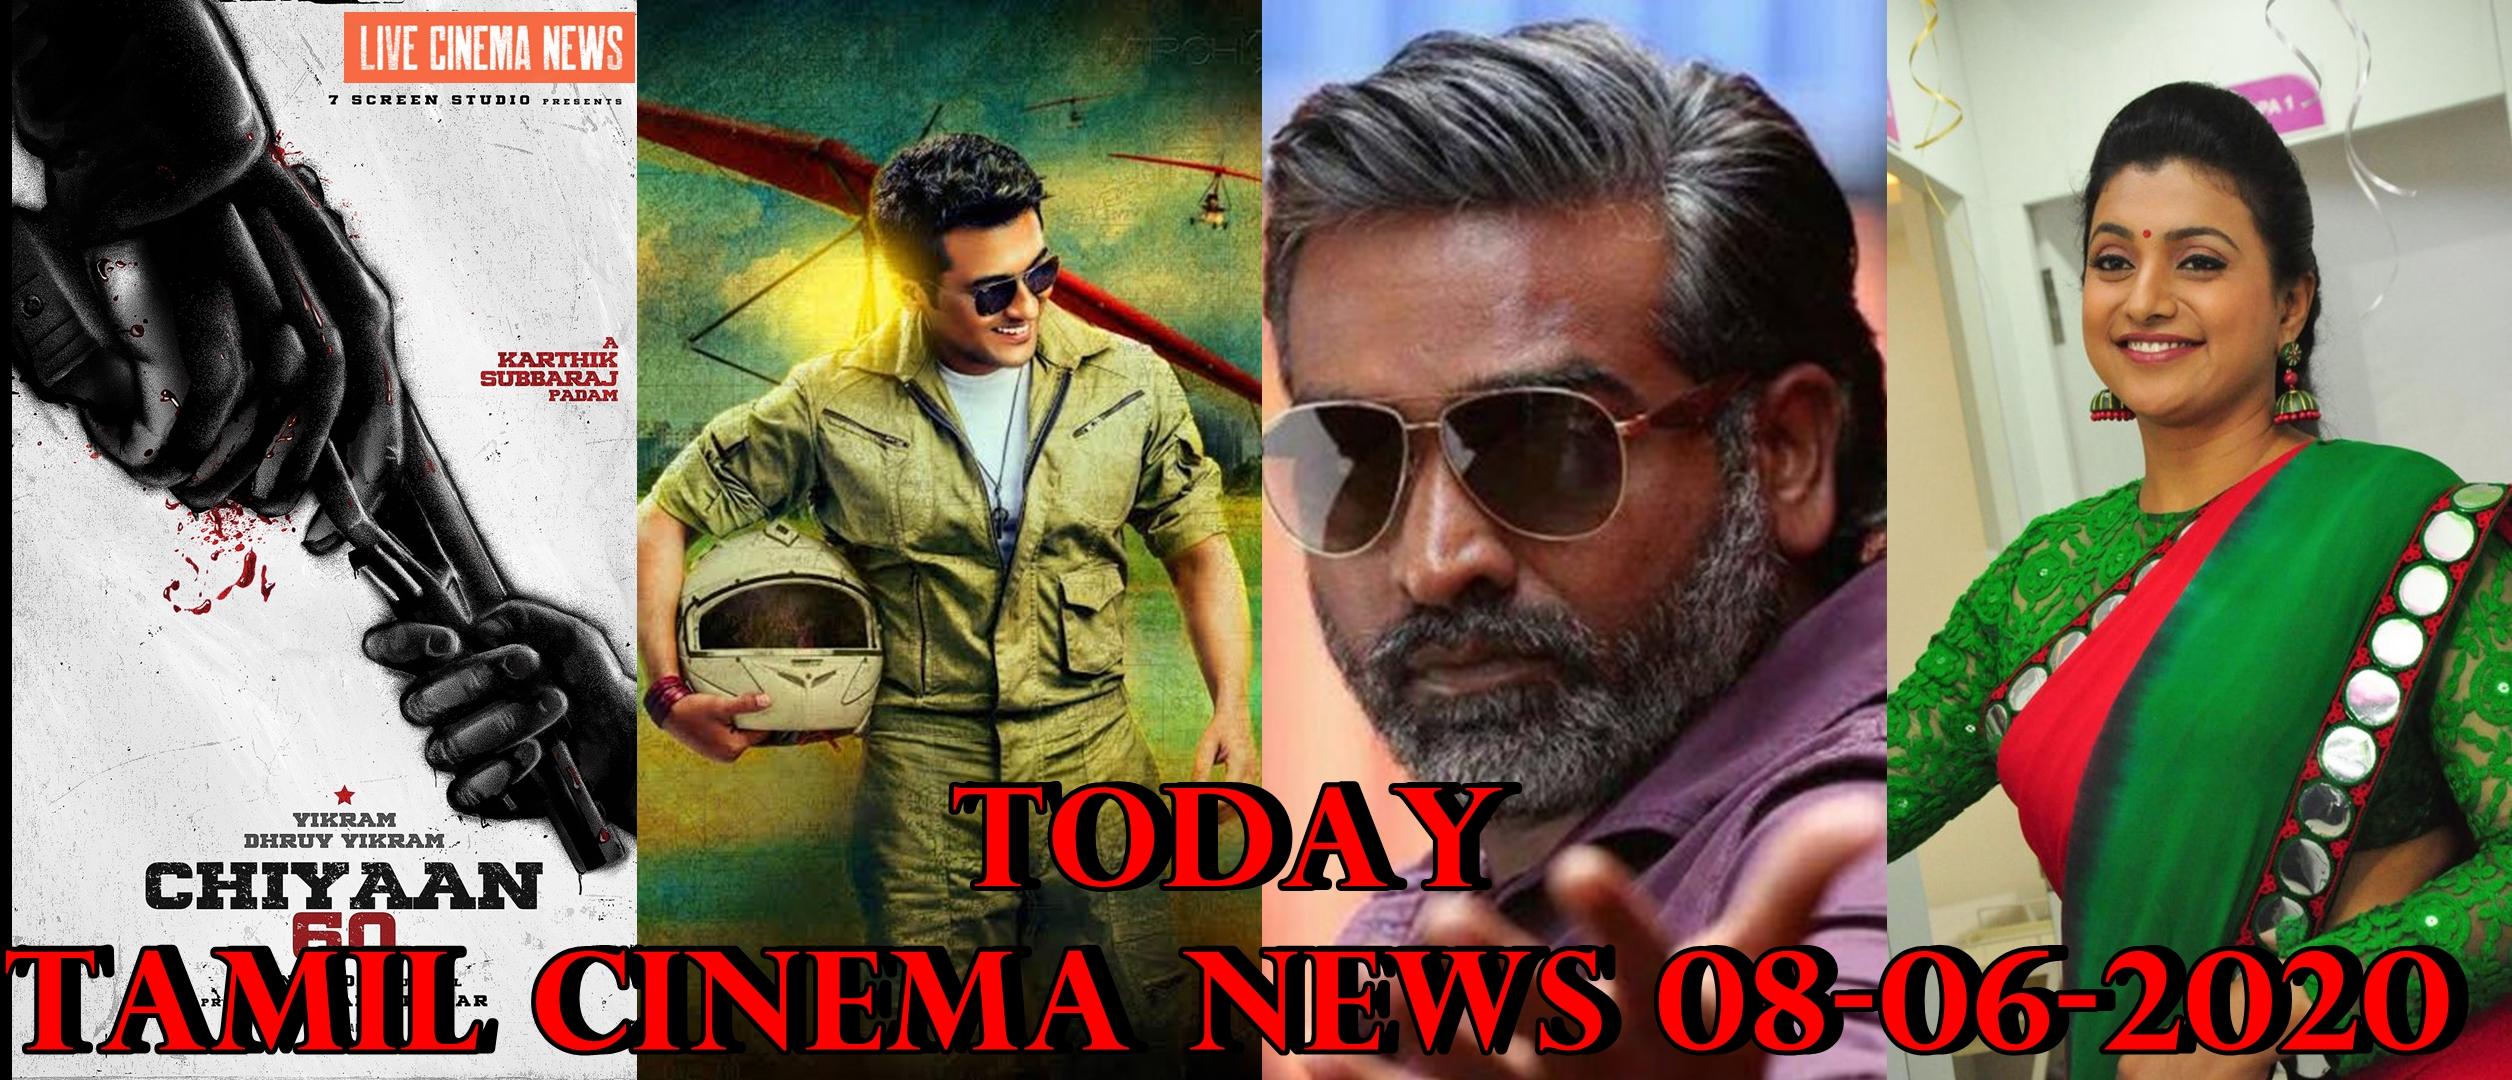 Today Tamil Cinema News 08-06-2020